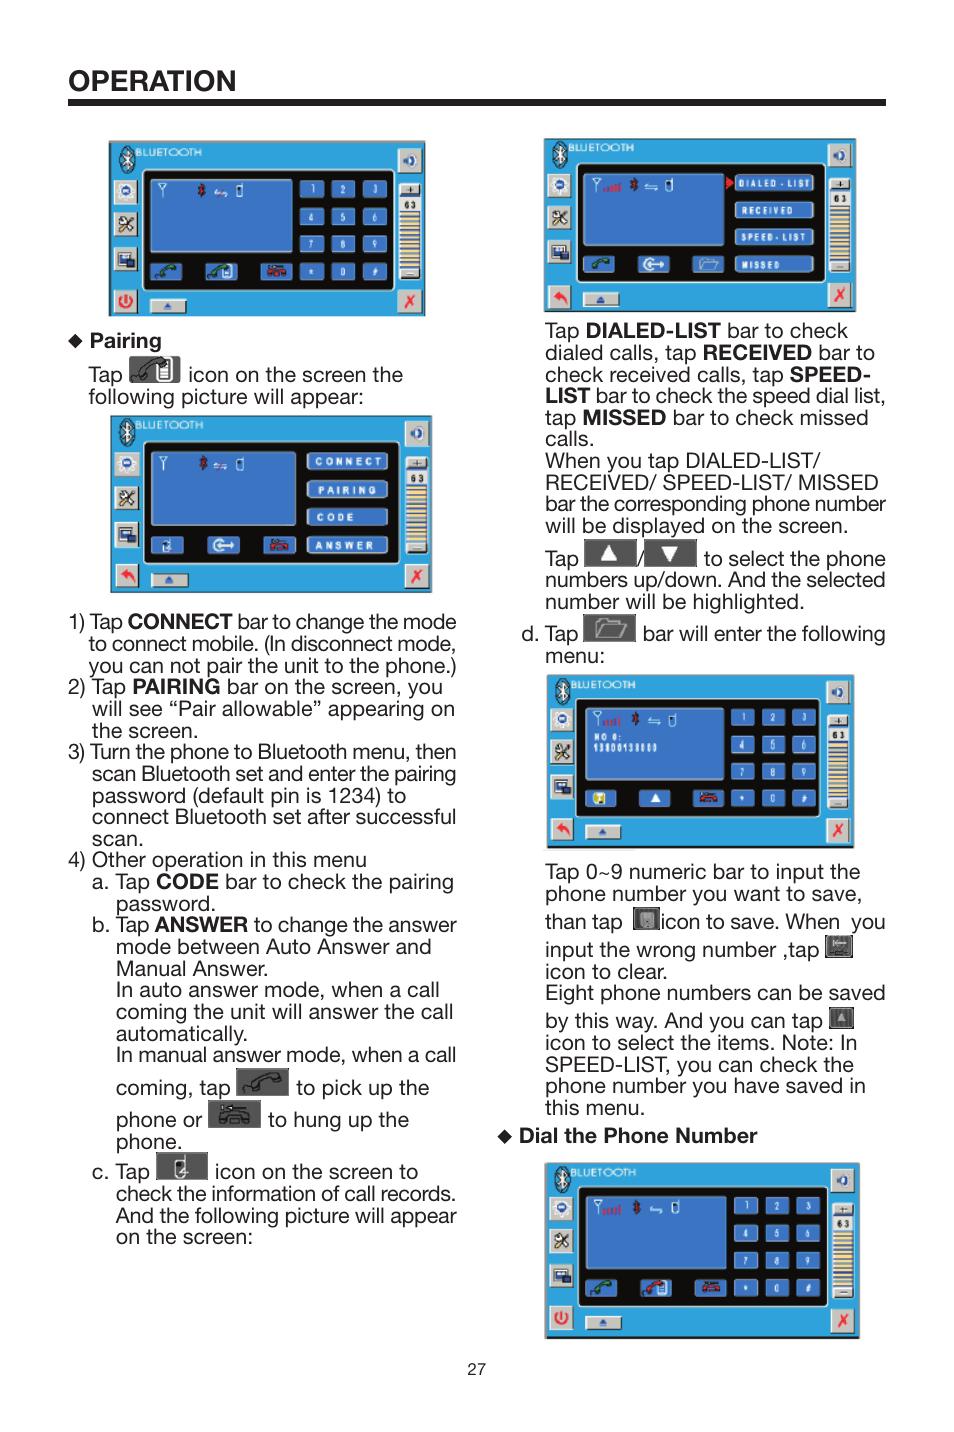 operation lanzar car audio sdbt75nu user manual page 26 29 rh manualsdir com Lanzar SD75MU Lanzar Speakers